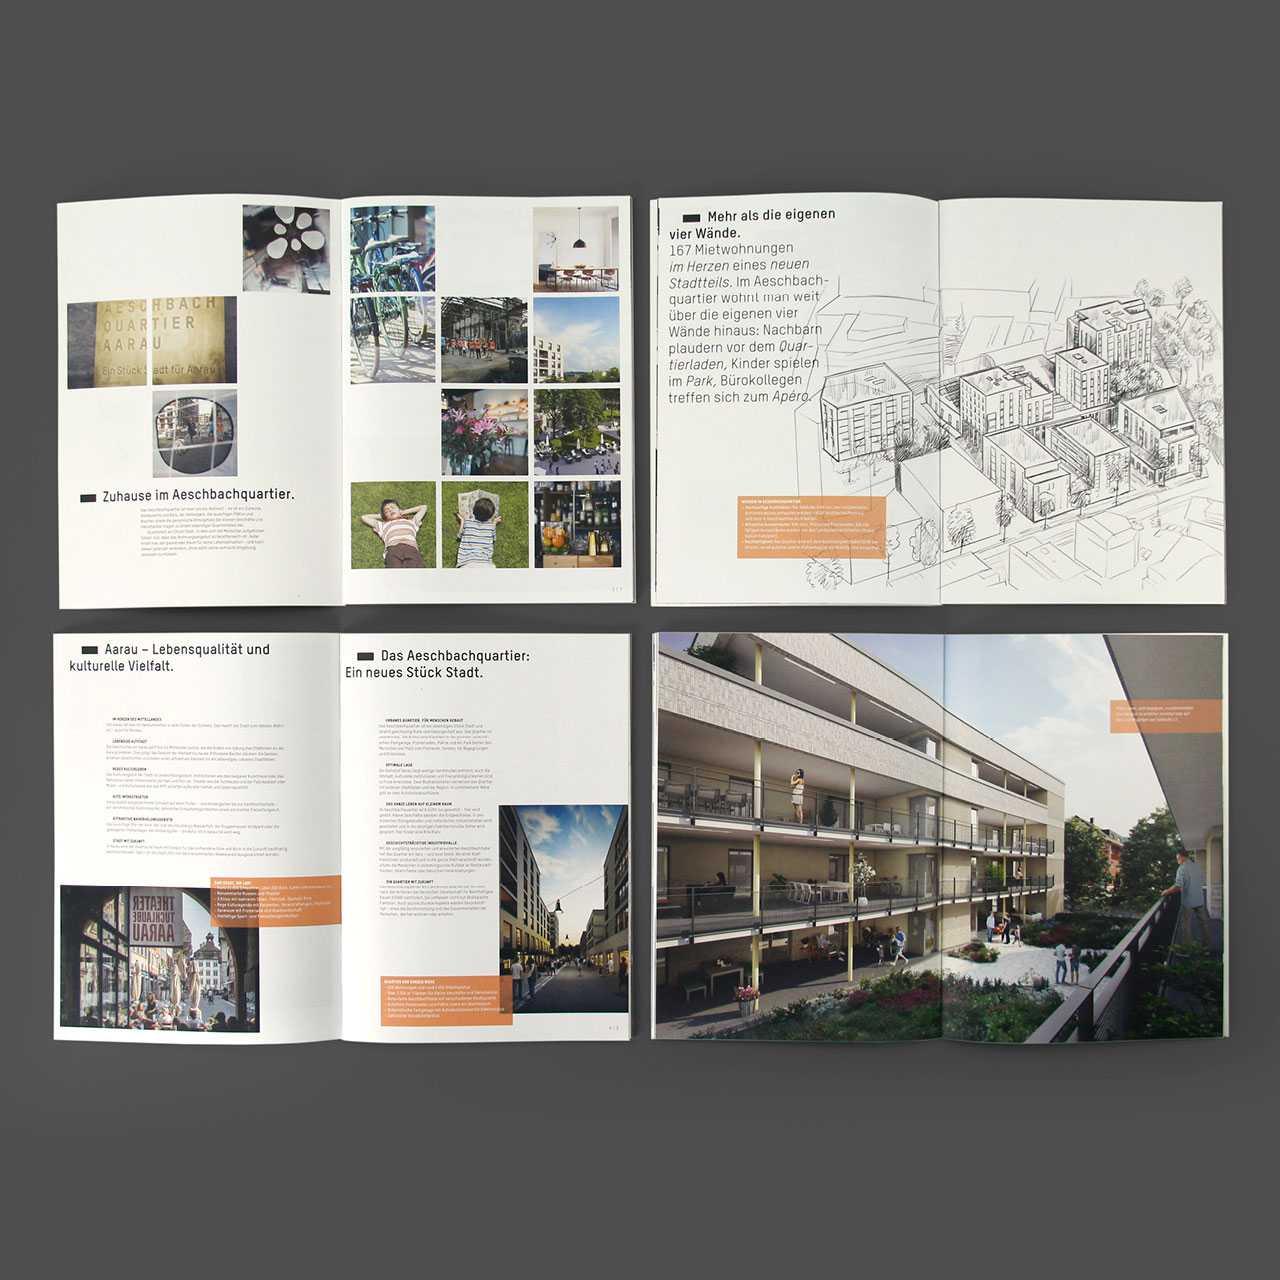 Aeschbachquartier Aarau by Mobimo AG: Printprodukte, Verkaufsbroschüre